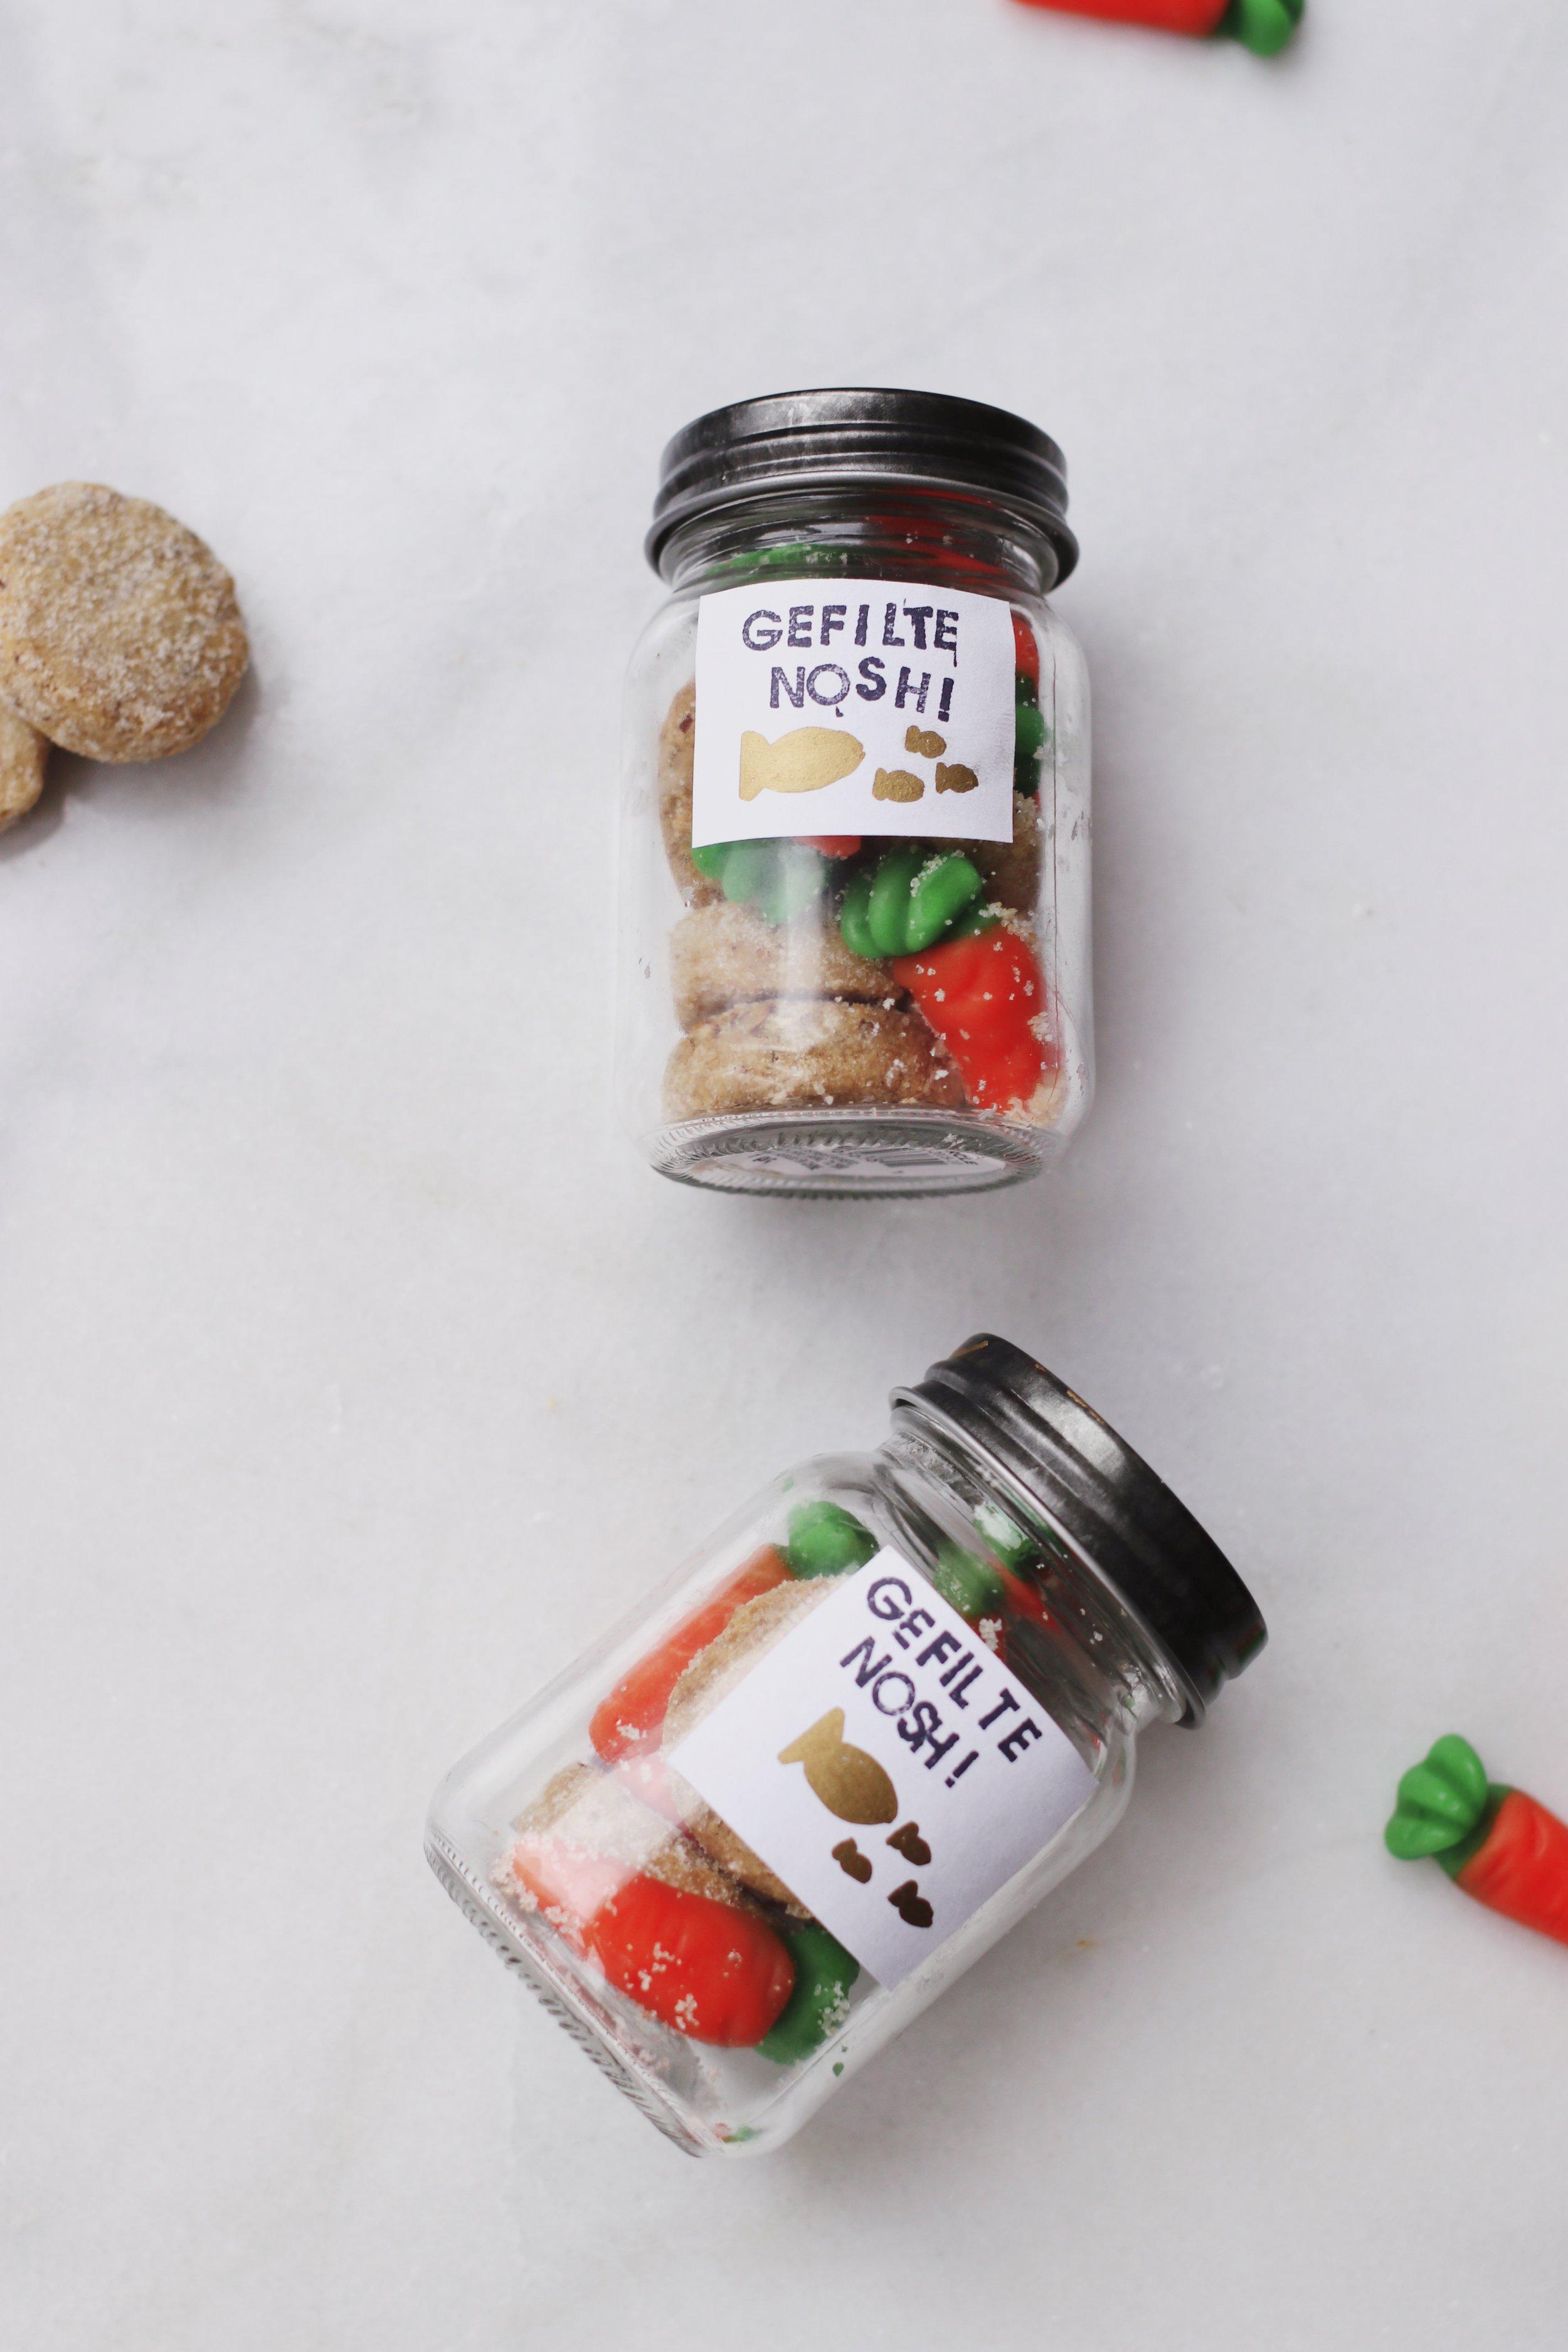 mishloach-manot-passover-favor-seder-gift-dessert-cookie-gefilte-fish-carrot-candy13